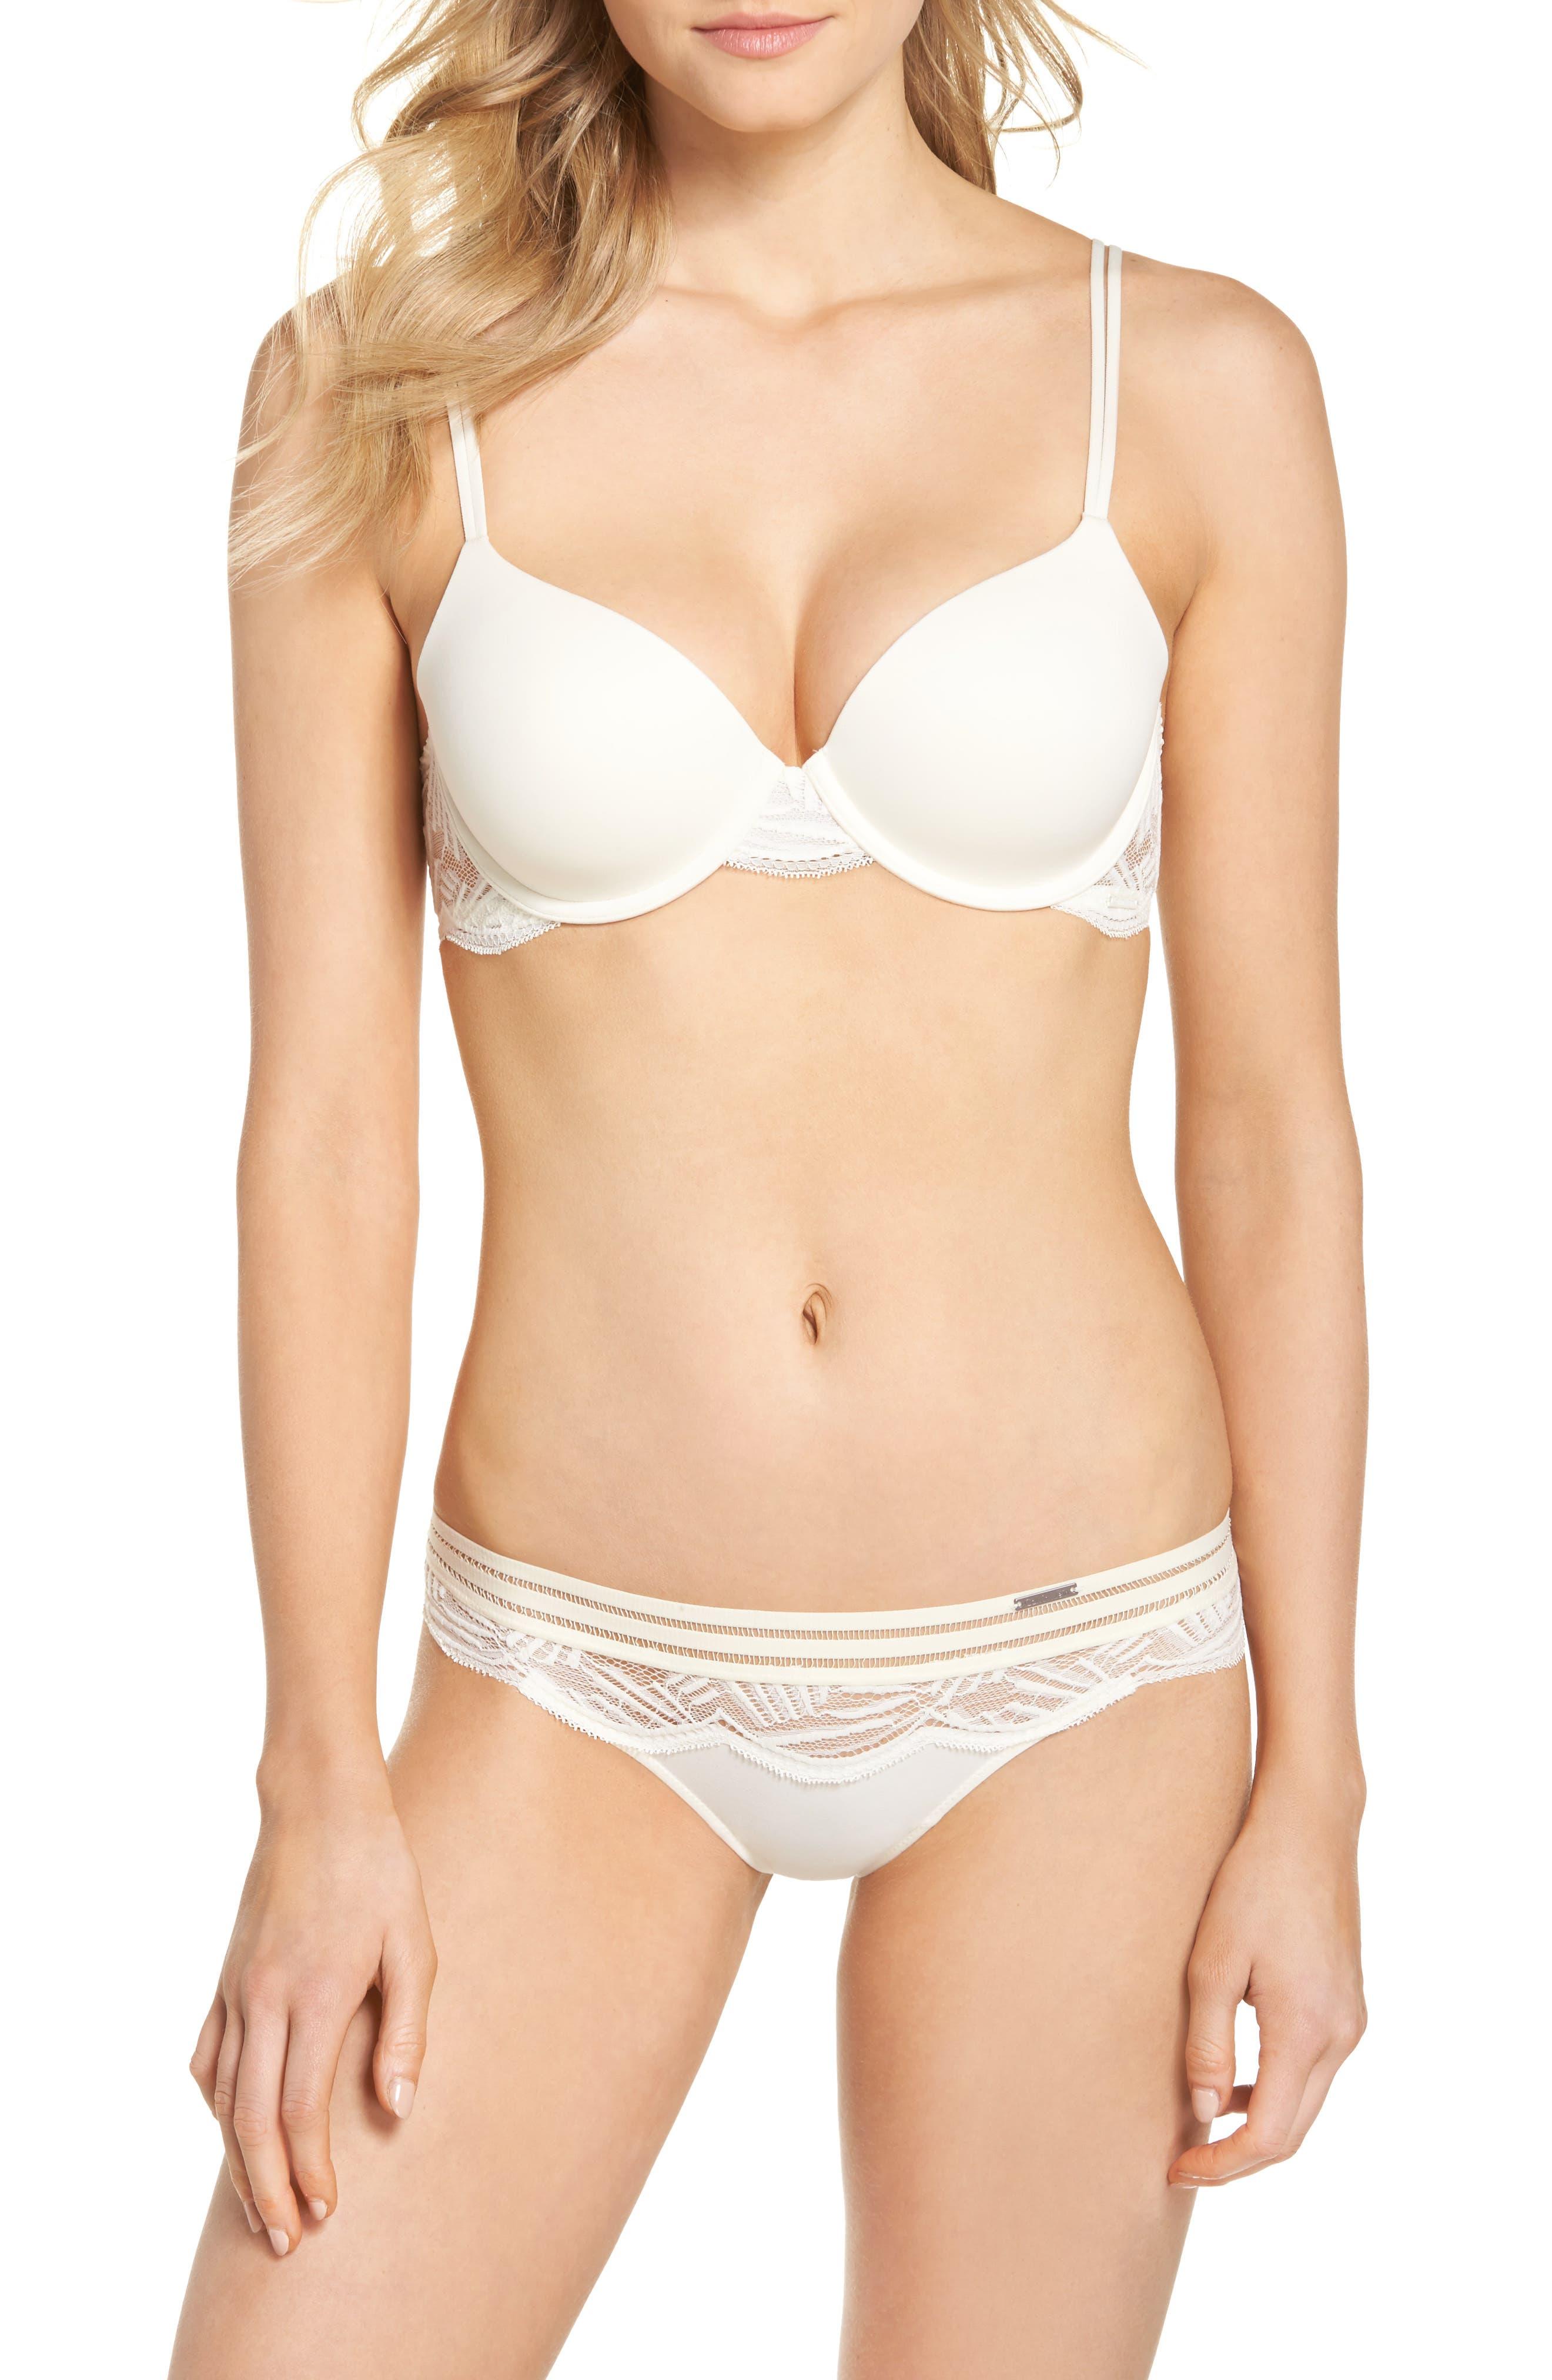 PF Slipcover Bikini,                             Alternate thumbnail 14, color,